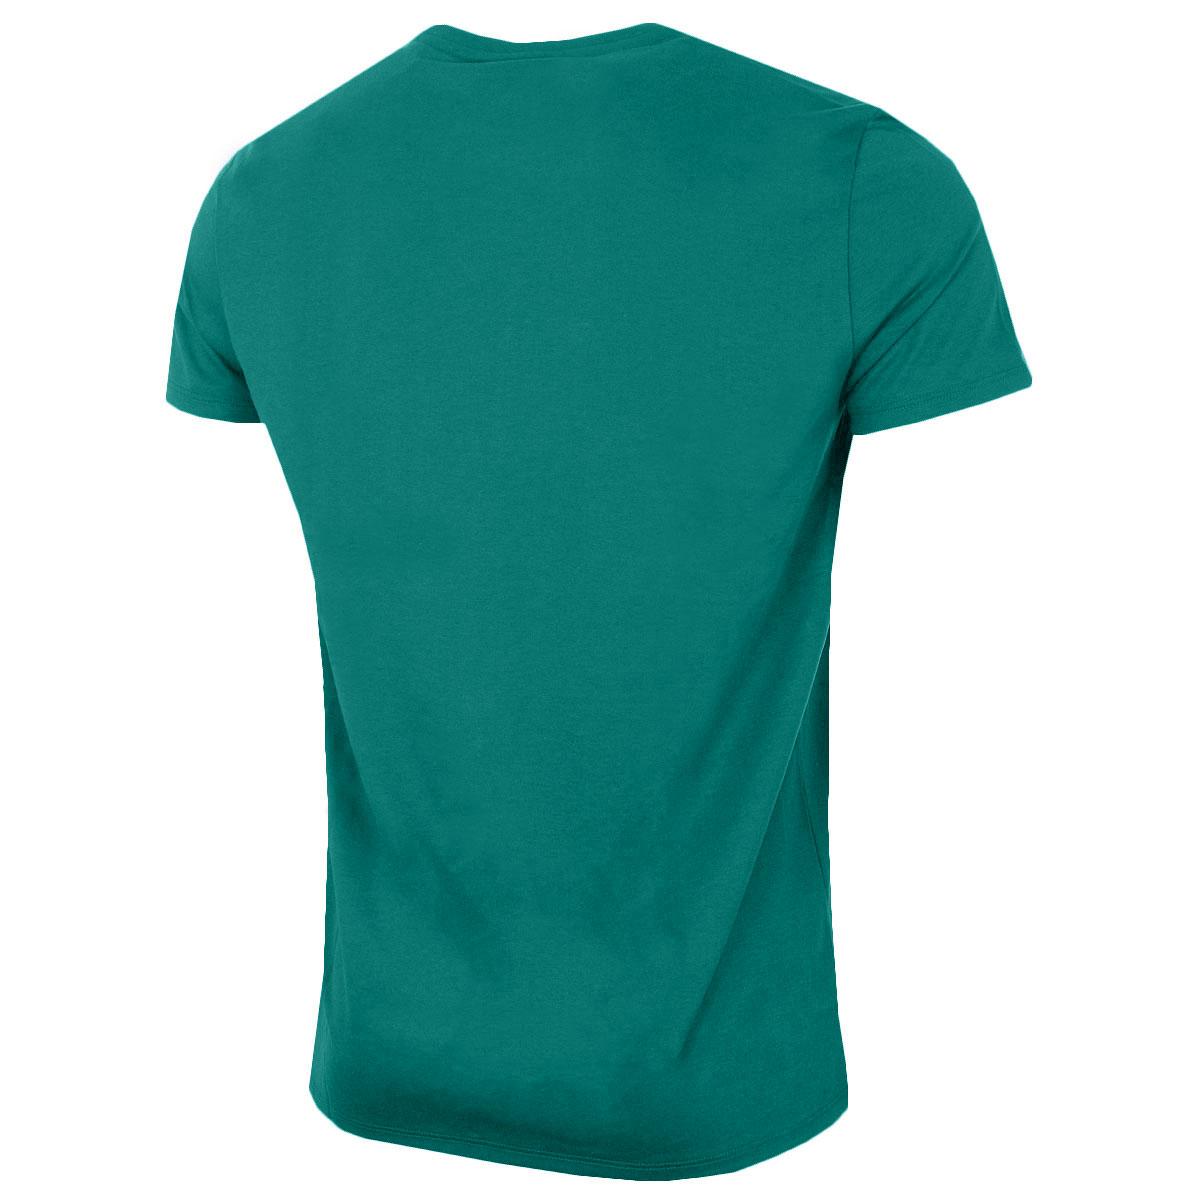 046ba467 Details about Lacoste Mens 2019 SS Crew Neck Pima Cotton Jersey Tee T-Shirt